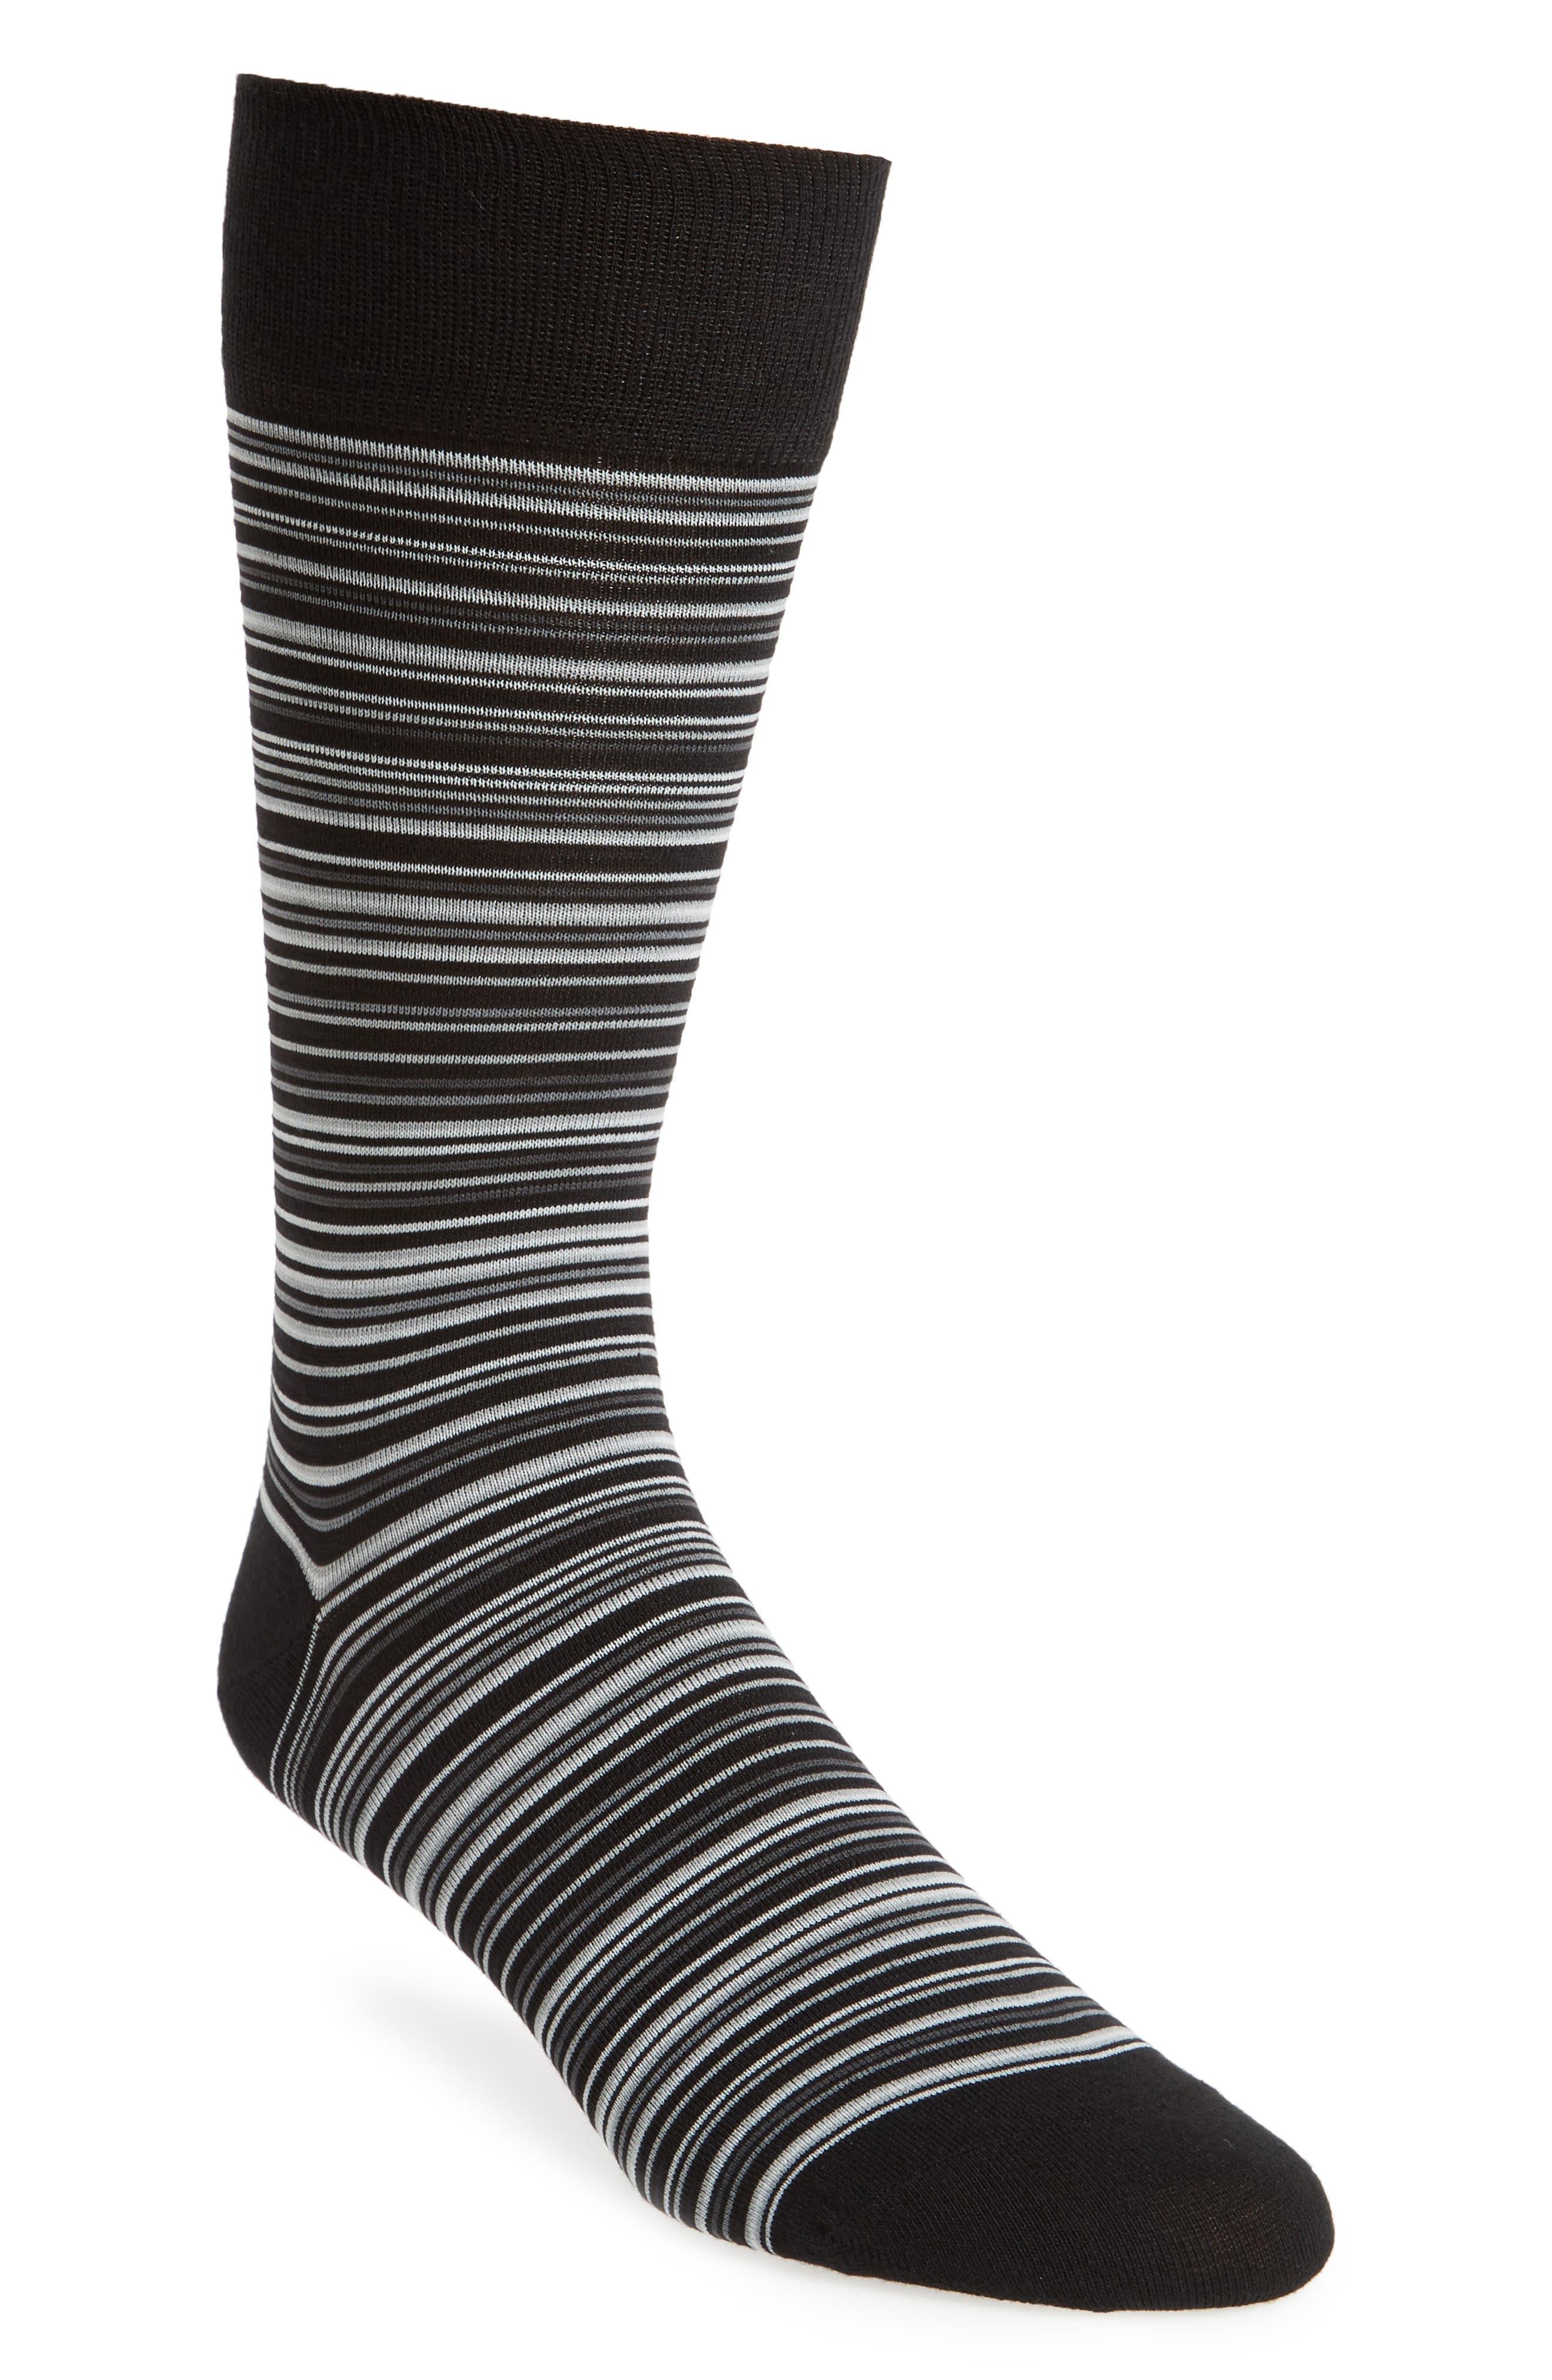 Multistripe Crew Socks,                             Main thumbnail 1, color,                             BLACK/ GREY